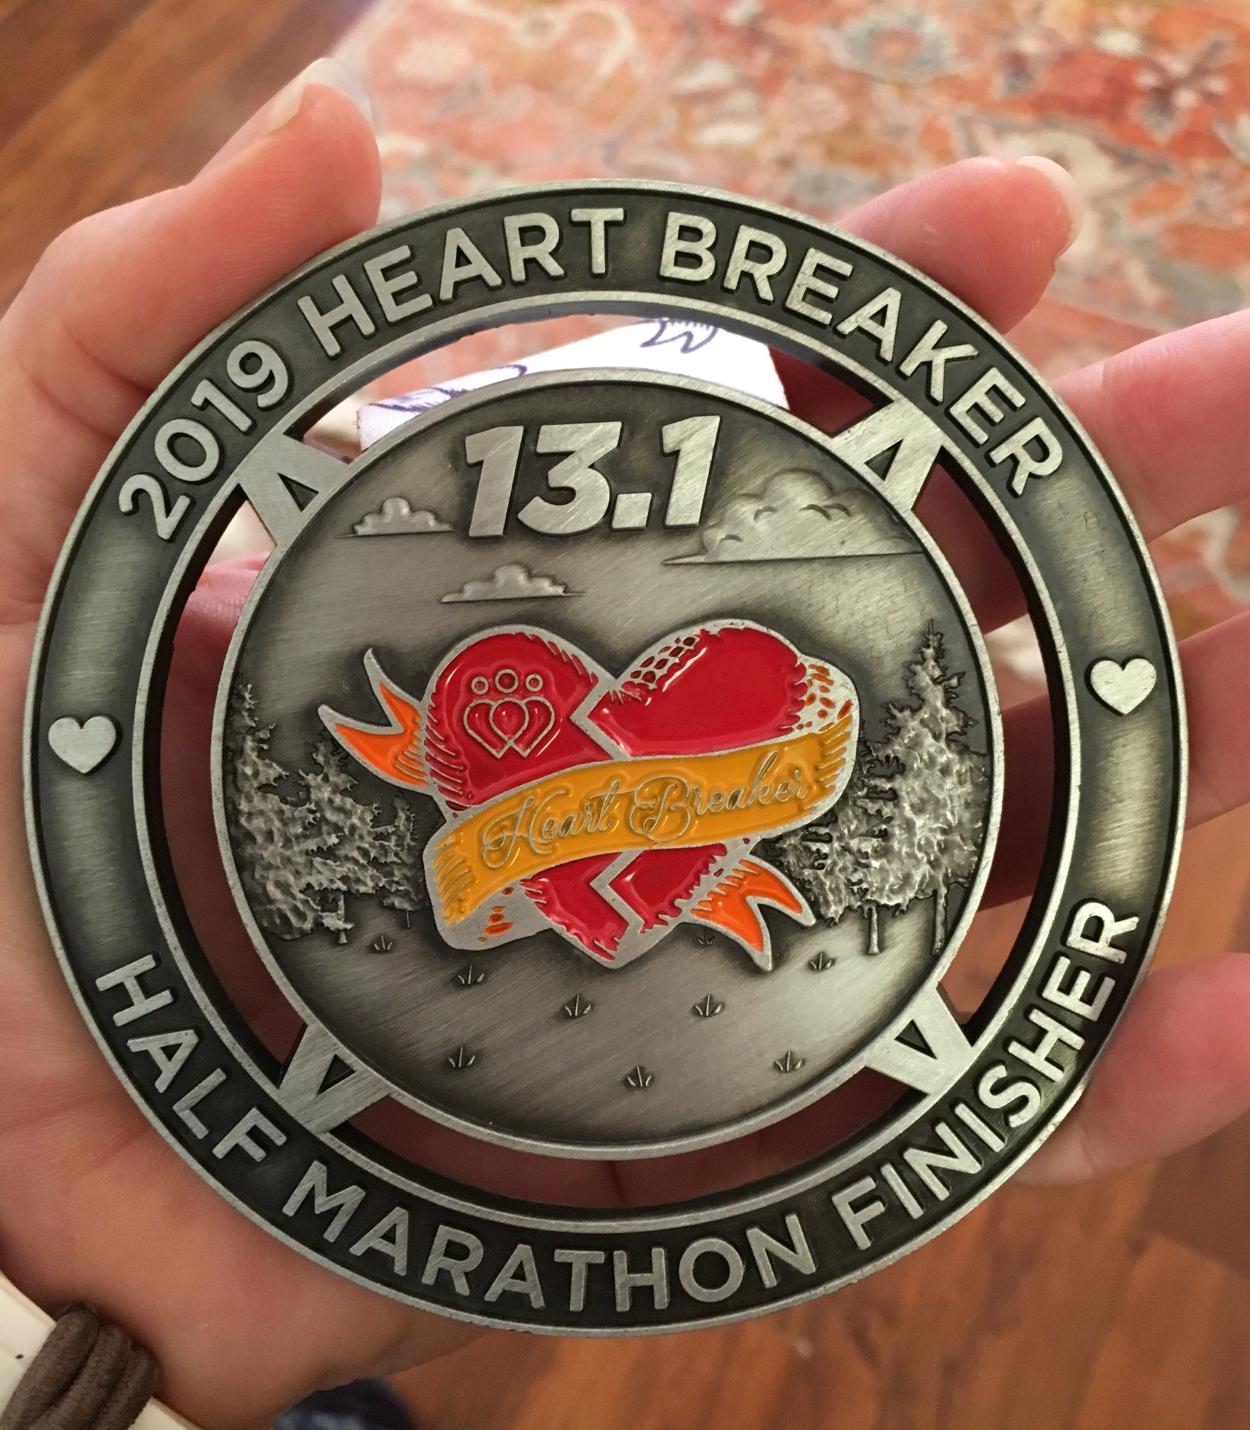 Heart Breaker Half Marathon Medal Portland Oregon 2019